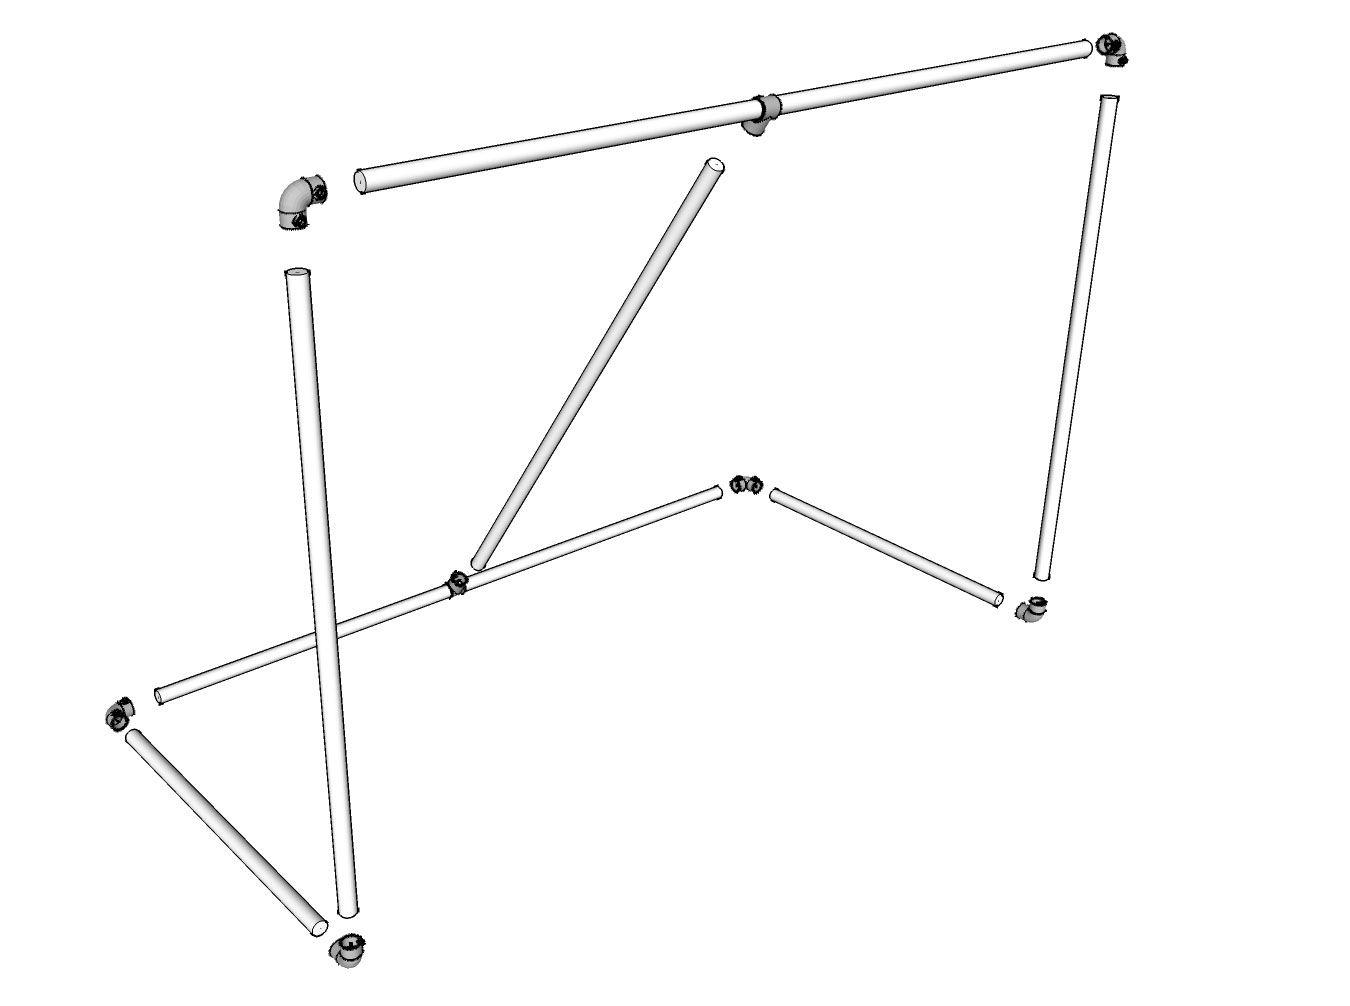 Build A Steel Hockey Goal Complete Diy Plans Simplified Building